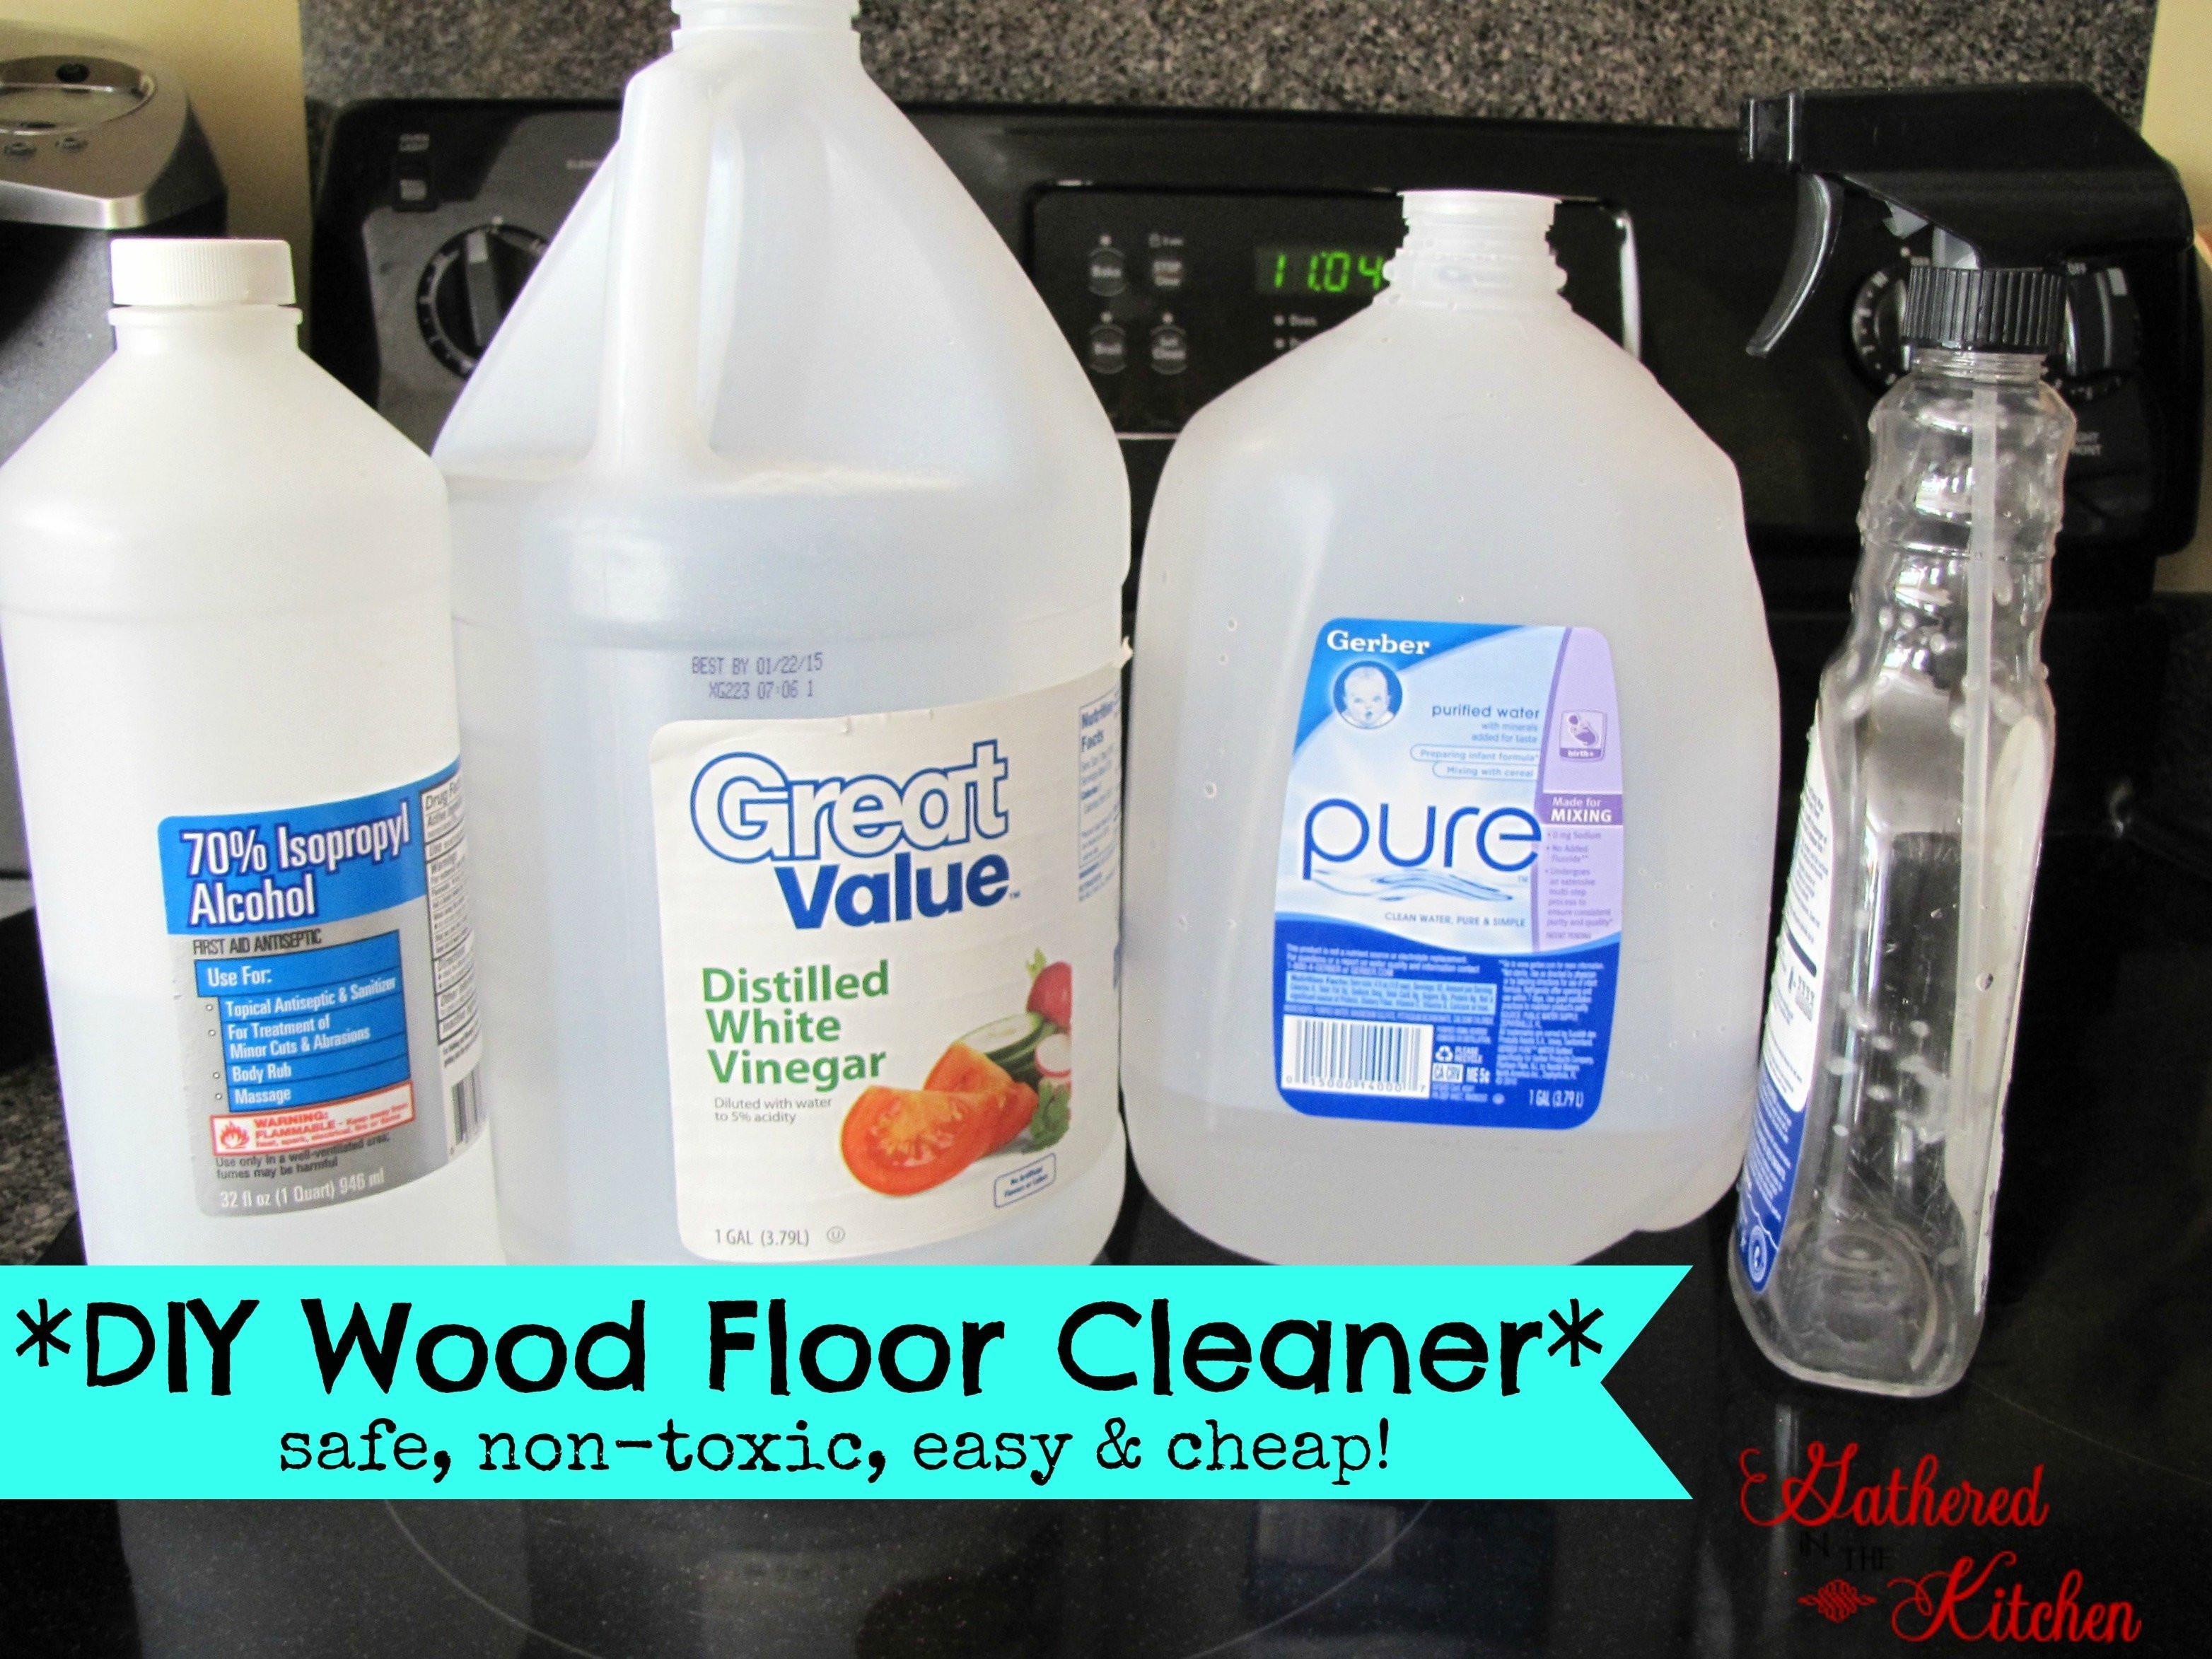 cleaning hardwood laminate floors with vinegar of wash laminate floors with vinegar image collections cheap laminate in wash laminate floors with vinegar image collections cheap laminate